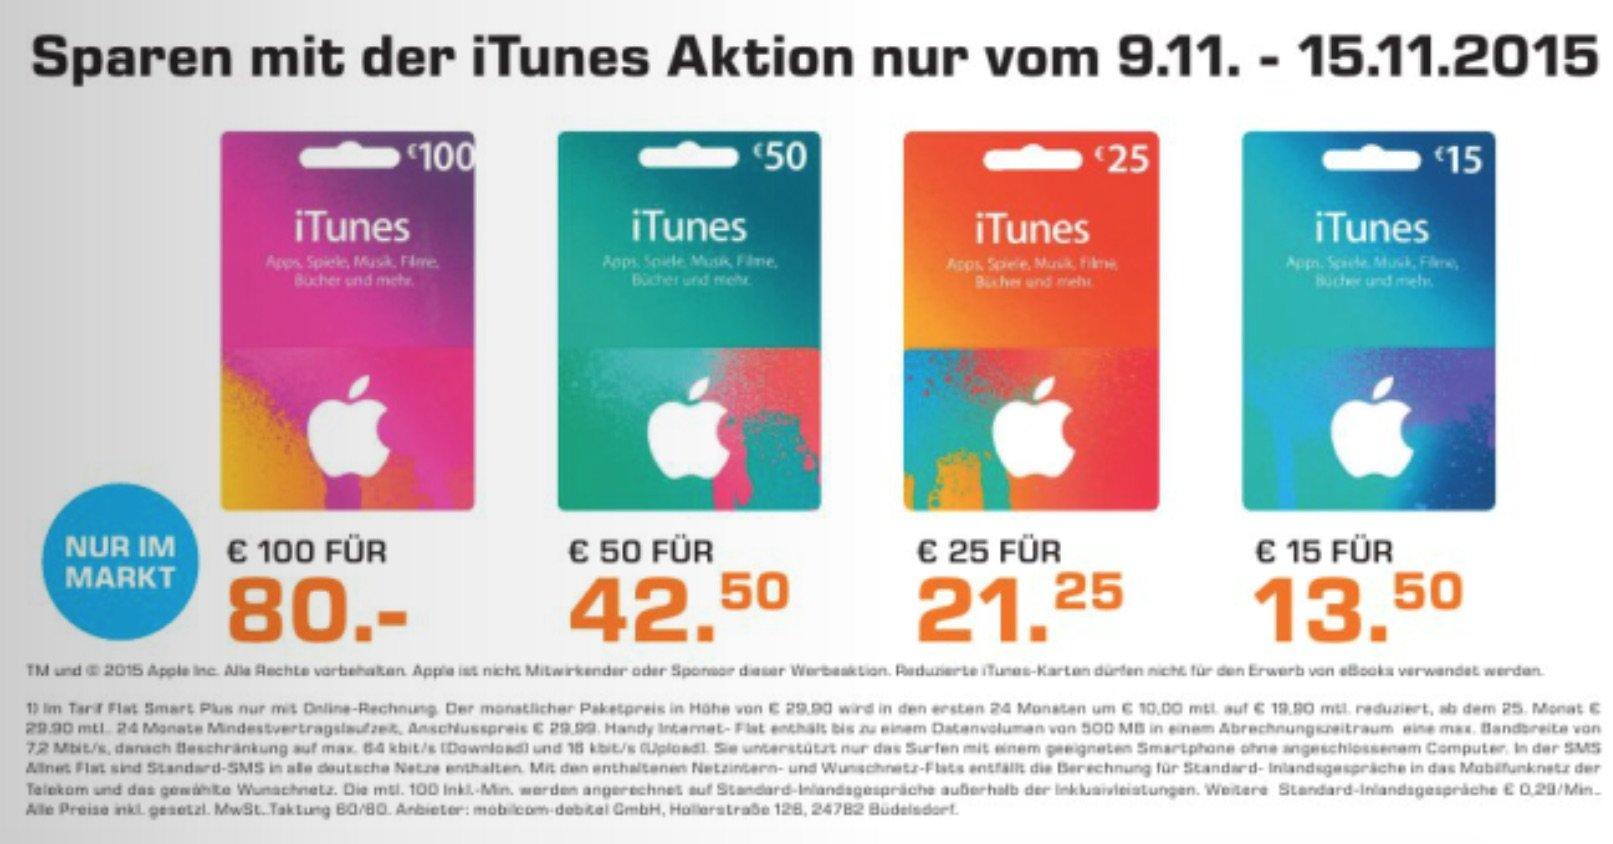 Paypal Karte.Itunes Karte Rabatt Apple Saturn Angebot Prozent Sparen